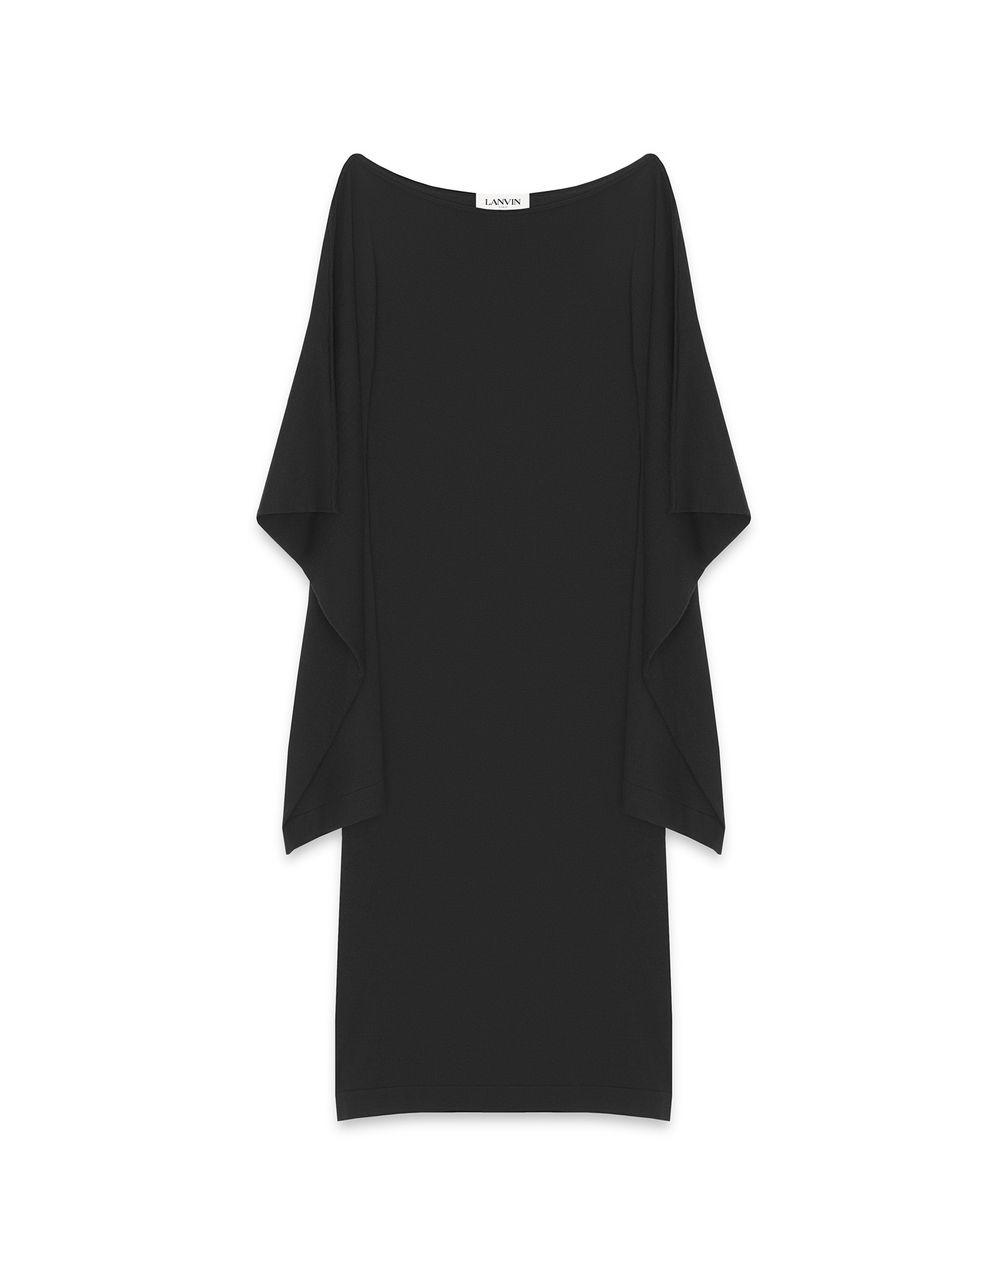 KNIT SHEATH DRESS WITH ASYMMETRIC SLEEVES - Lanvin